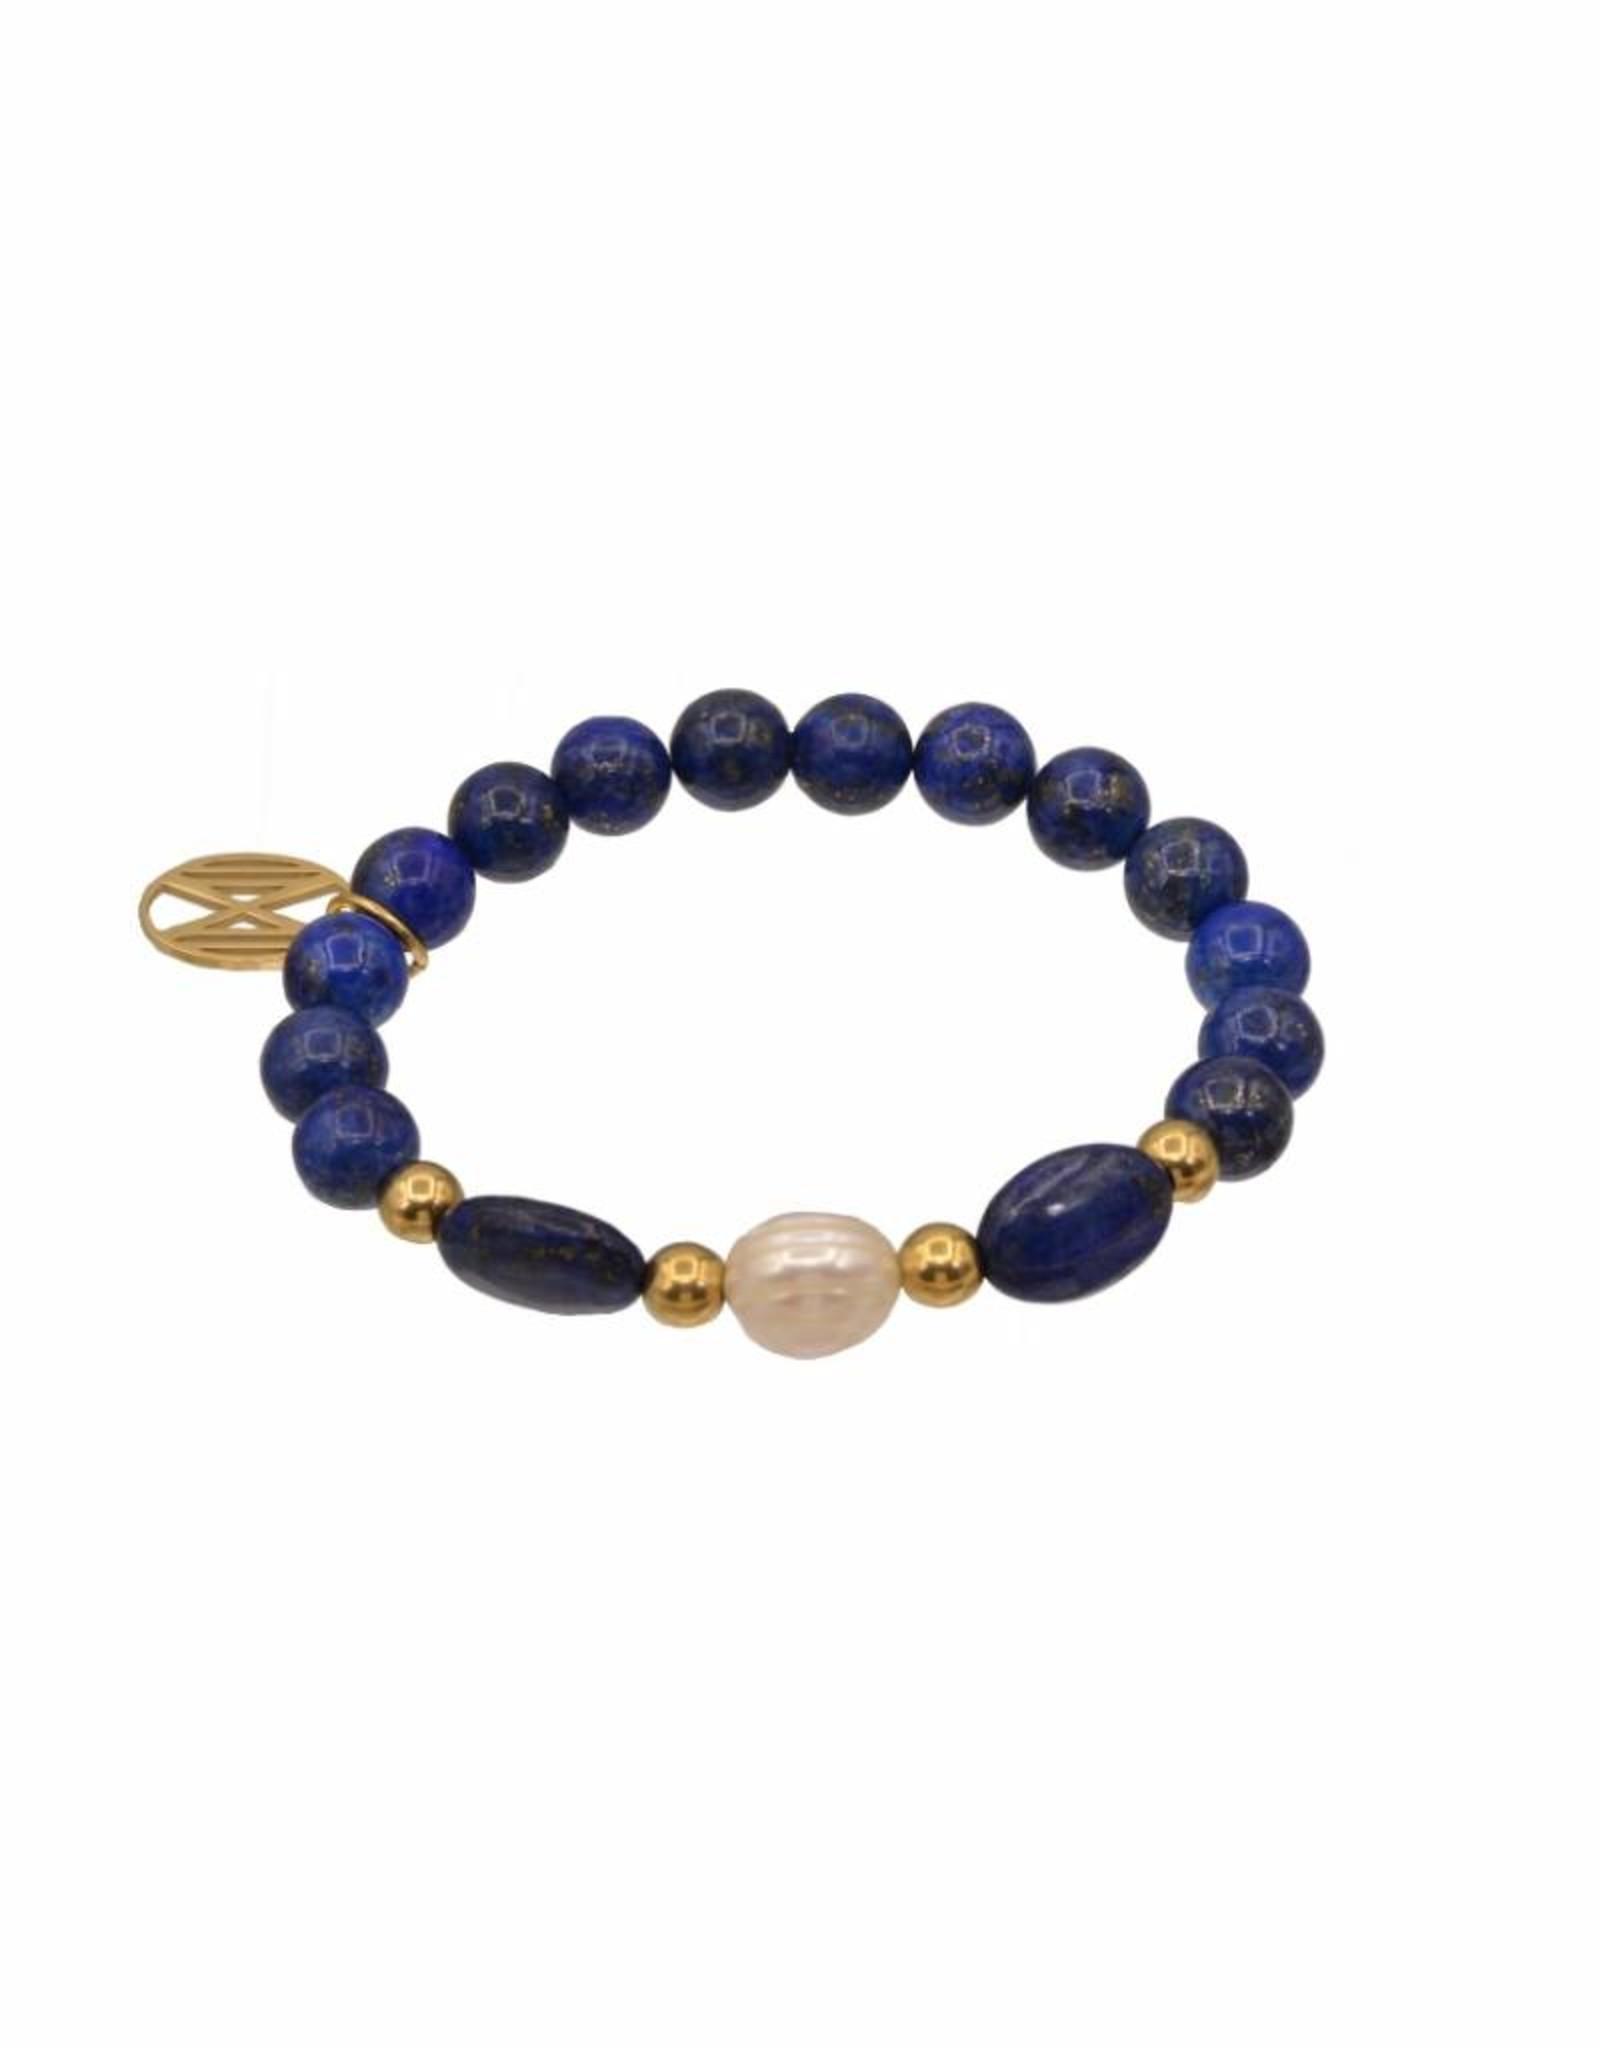 Lapis Lazuli en zoetwaterparel